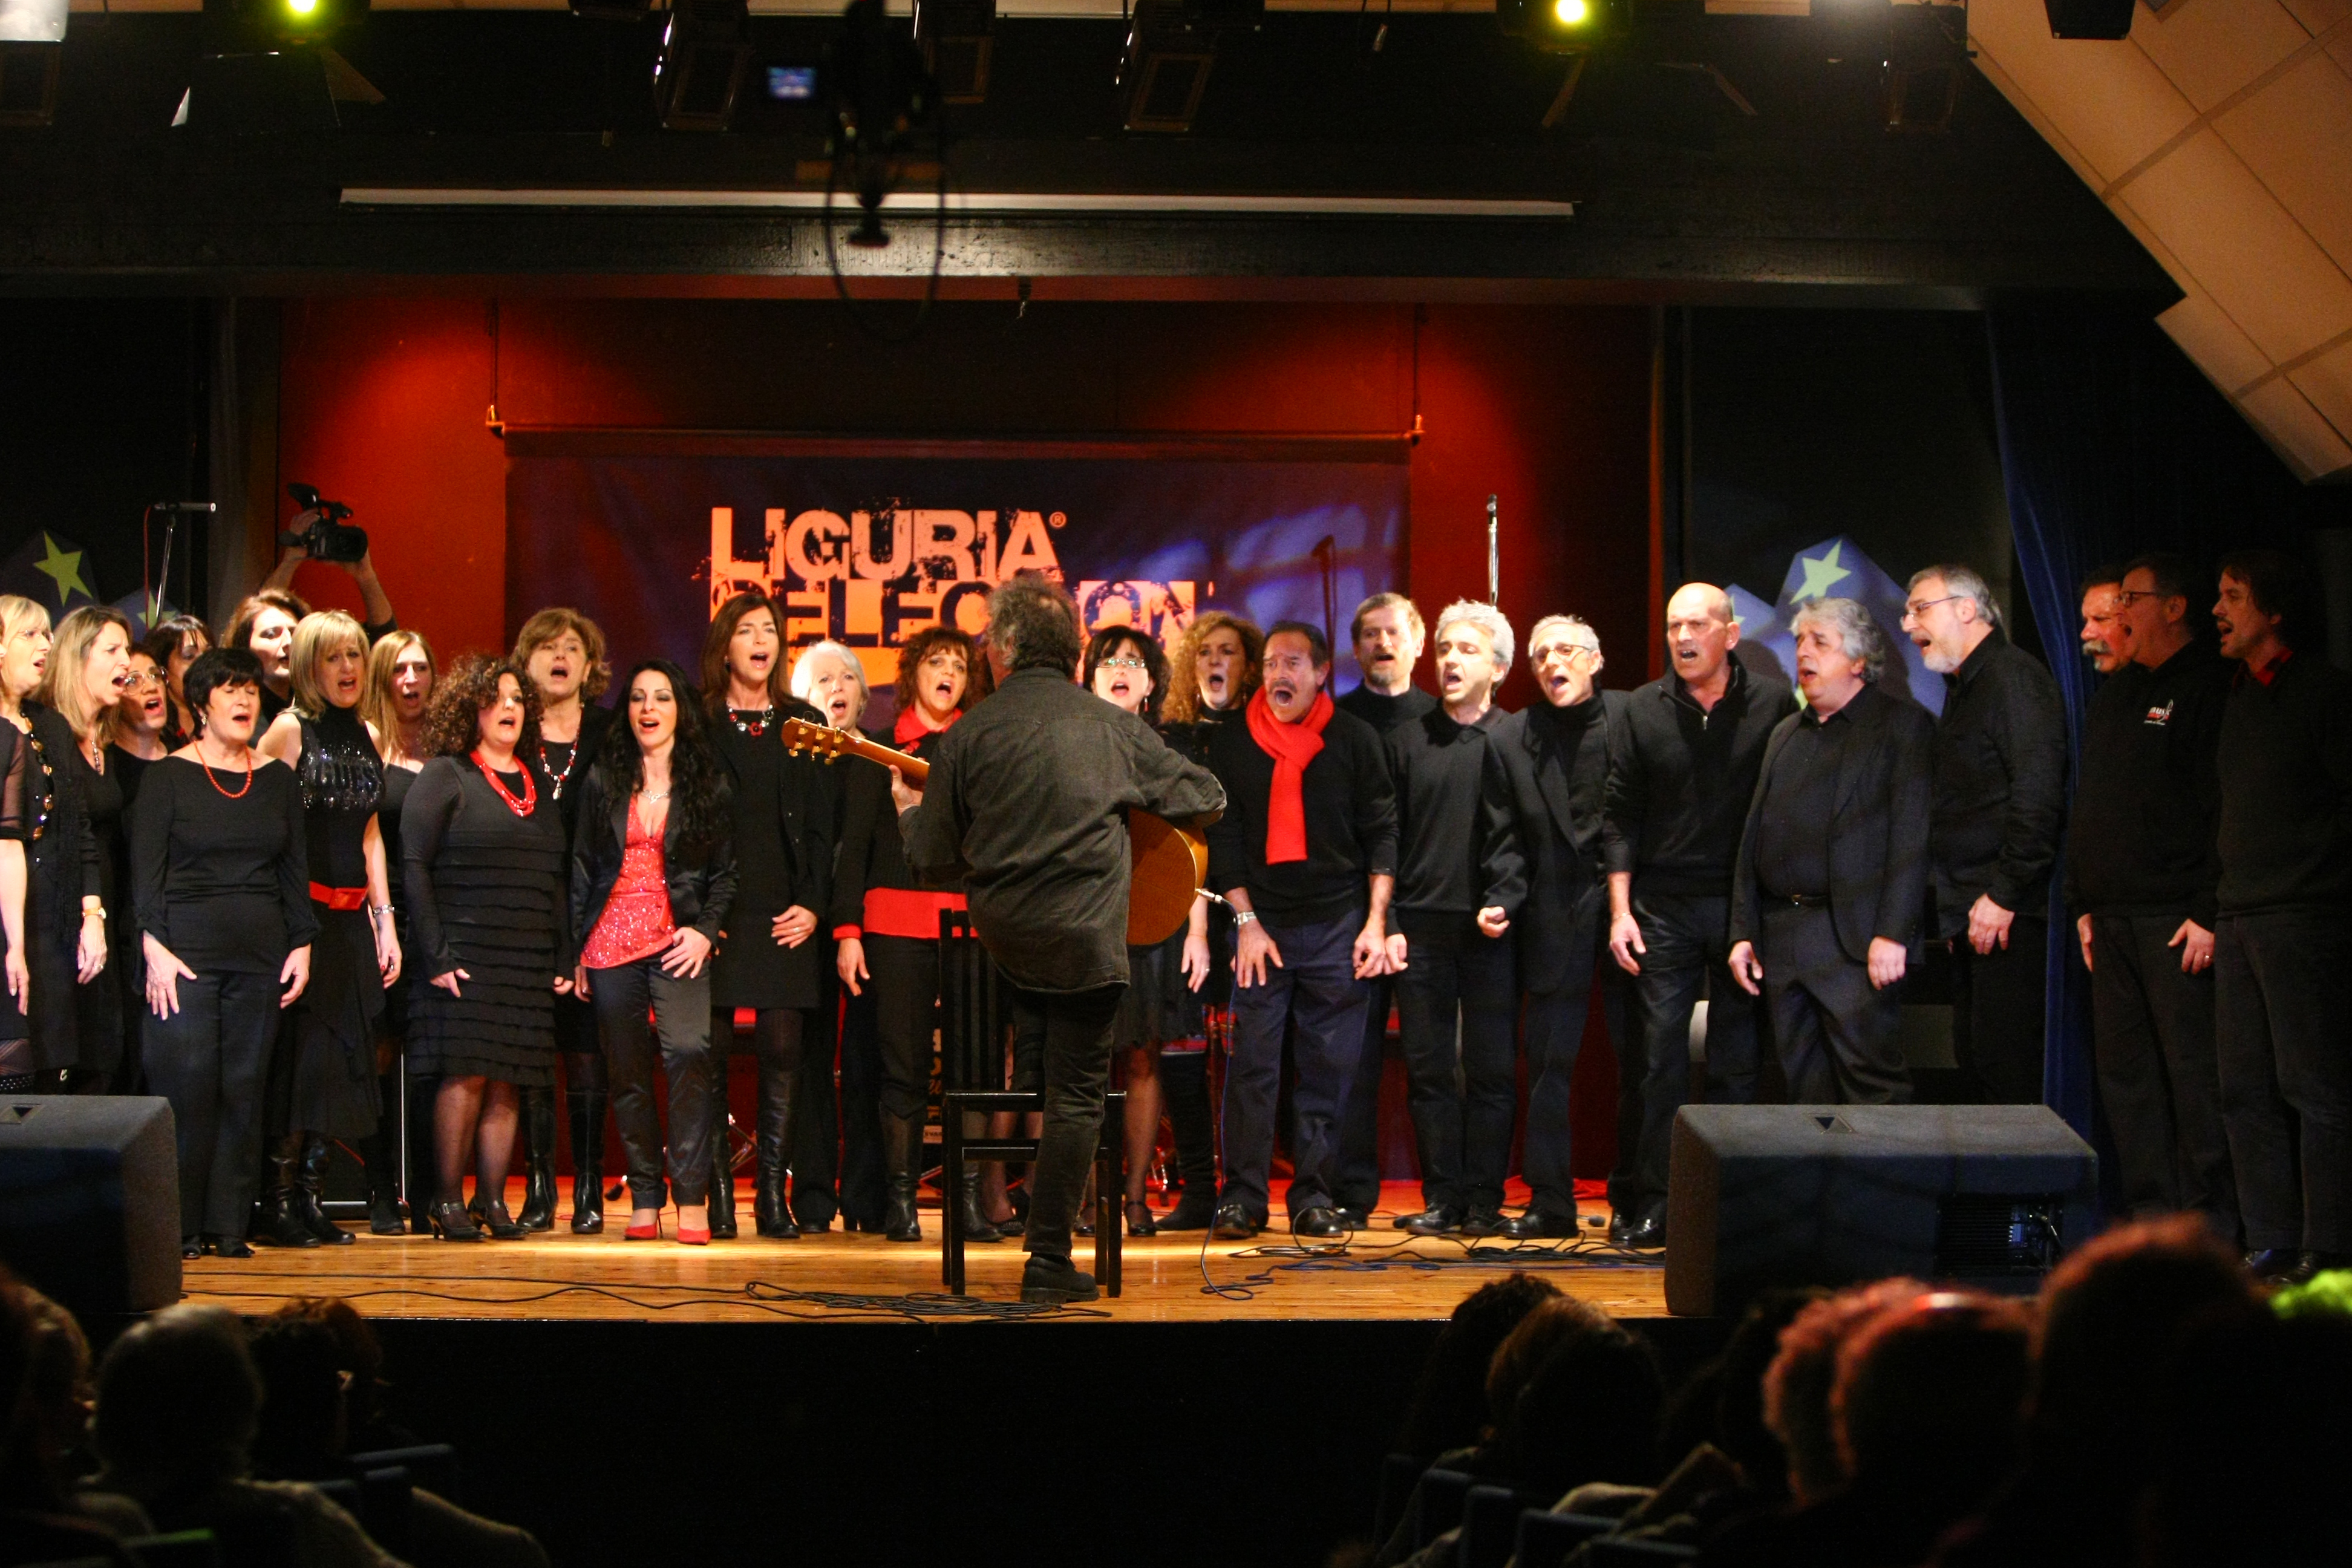 8 GENNAIO E 12 FEBBRAIO 2011 - CONCORSO LIGURIA SELECTION - Contralti fino a viv